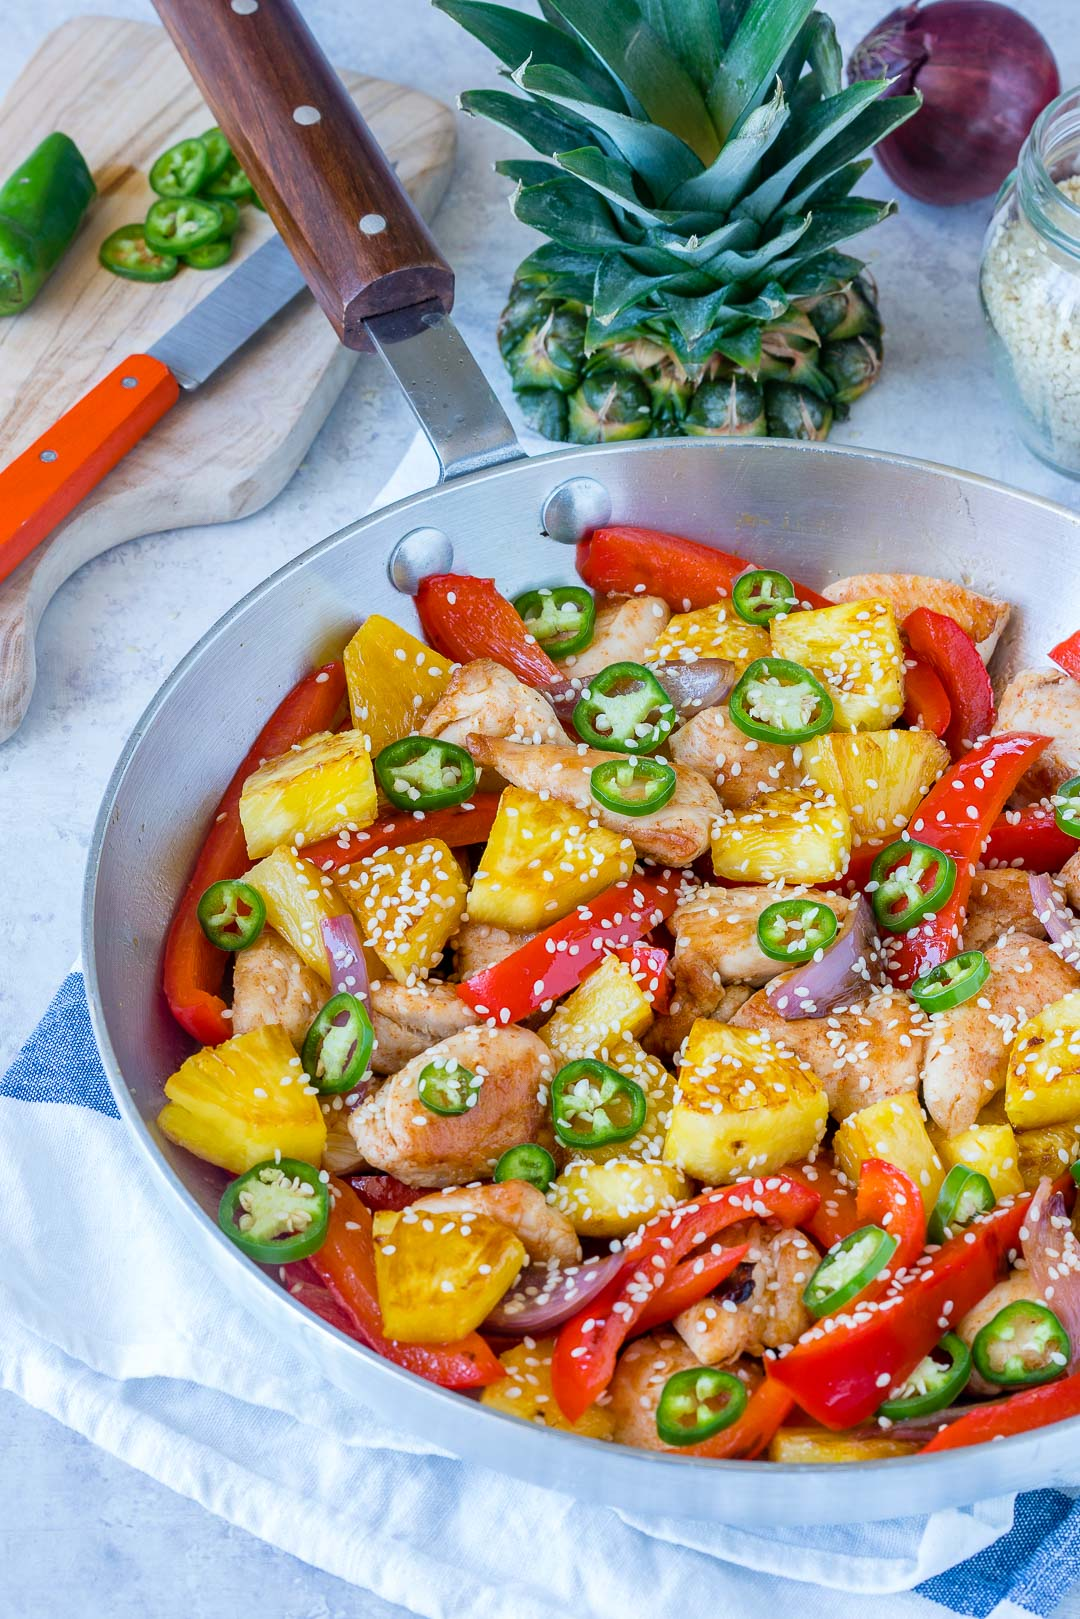 Healthy Sweet & Spicy Pineapple Chicken Skillet